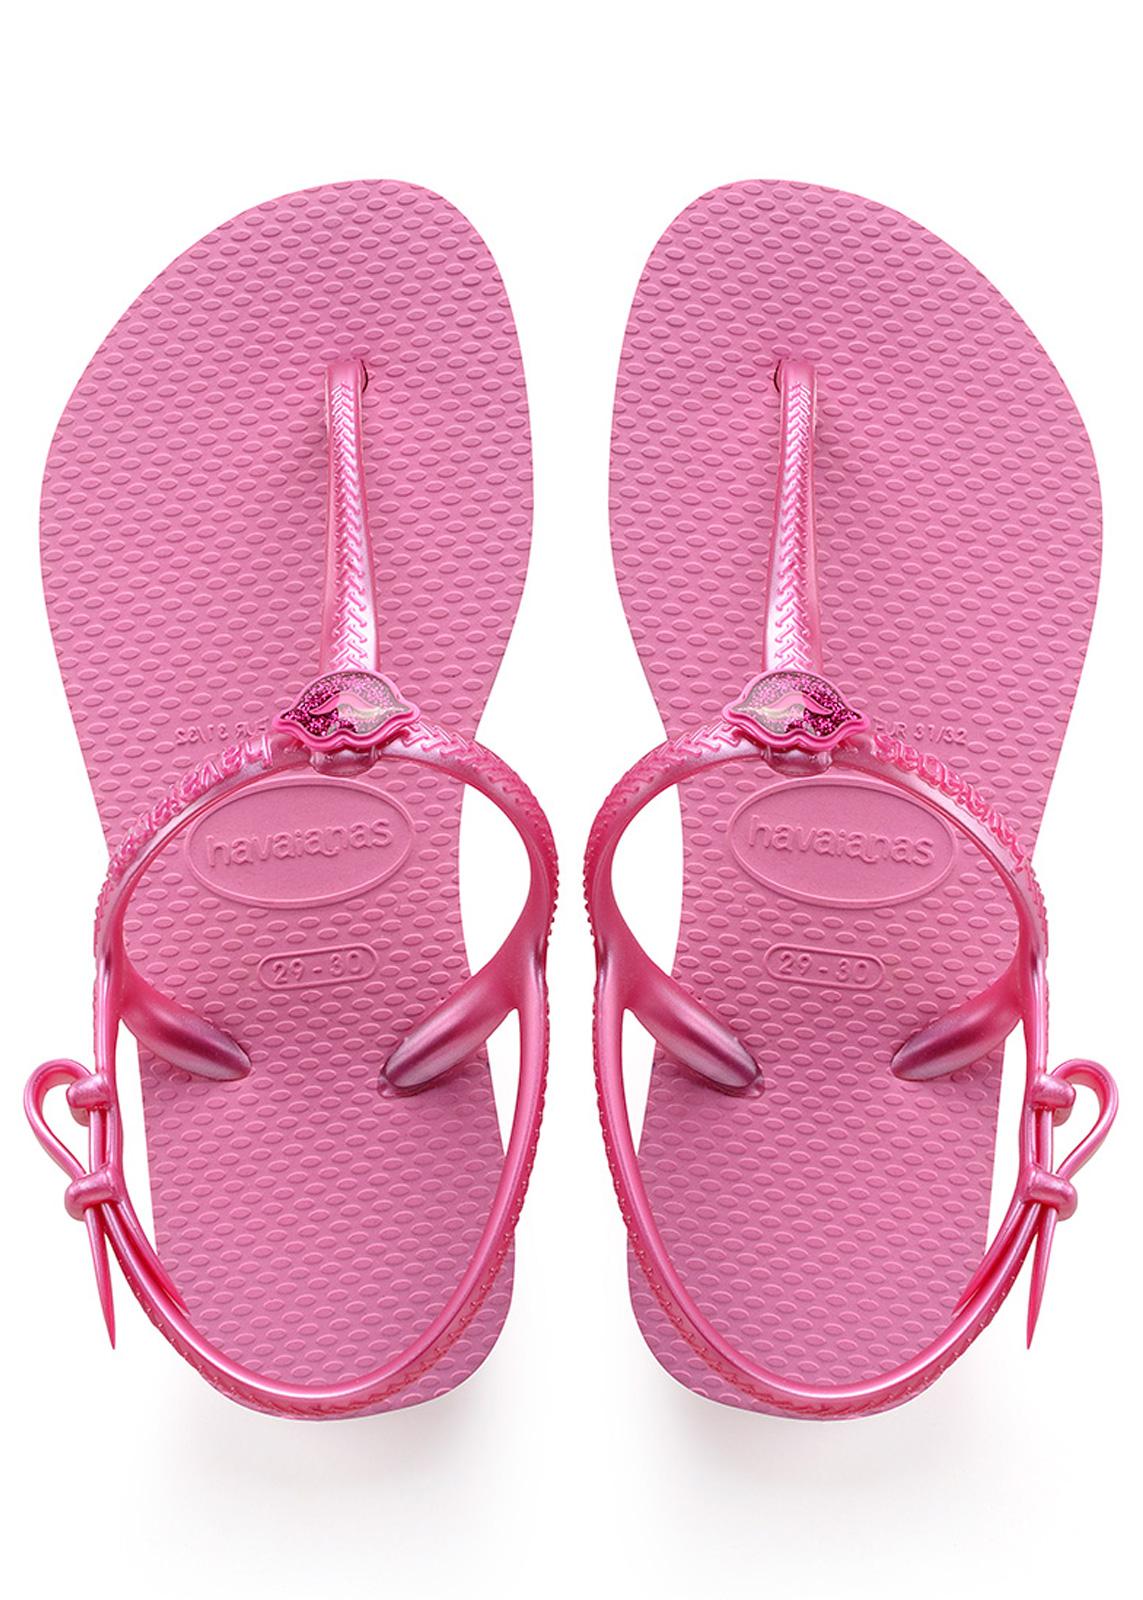 5f659227892c44 Flip-Flops Kids Freedom Lipstick Rose - Brand Havaianas